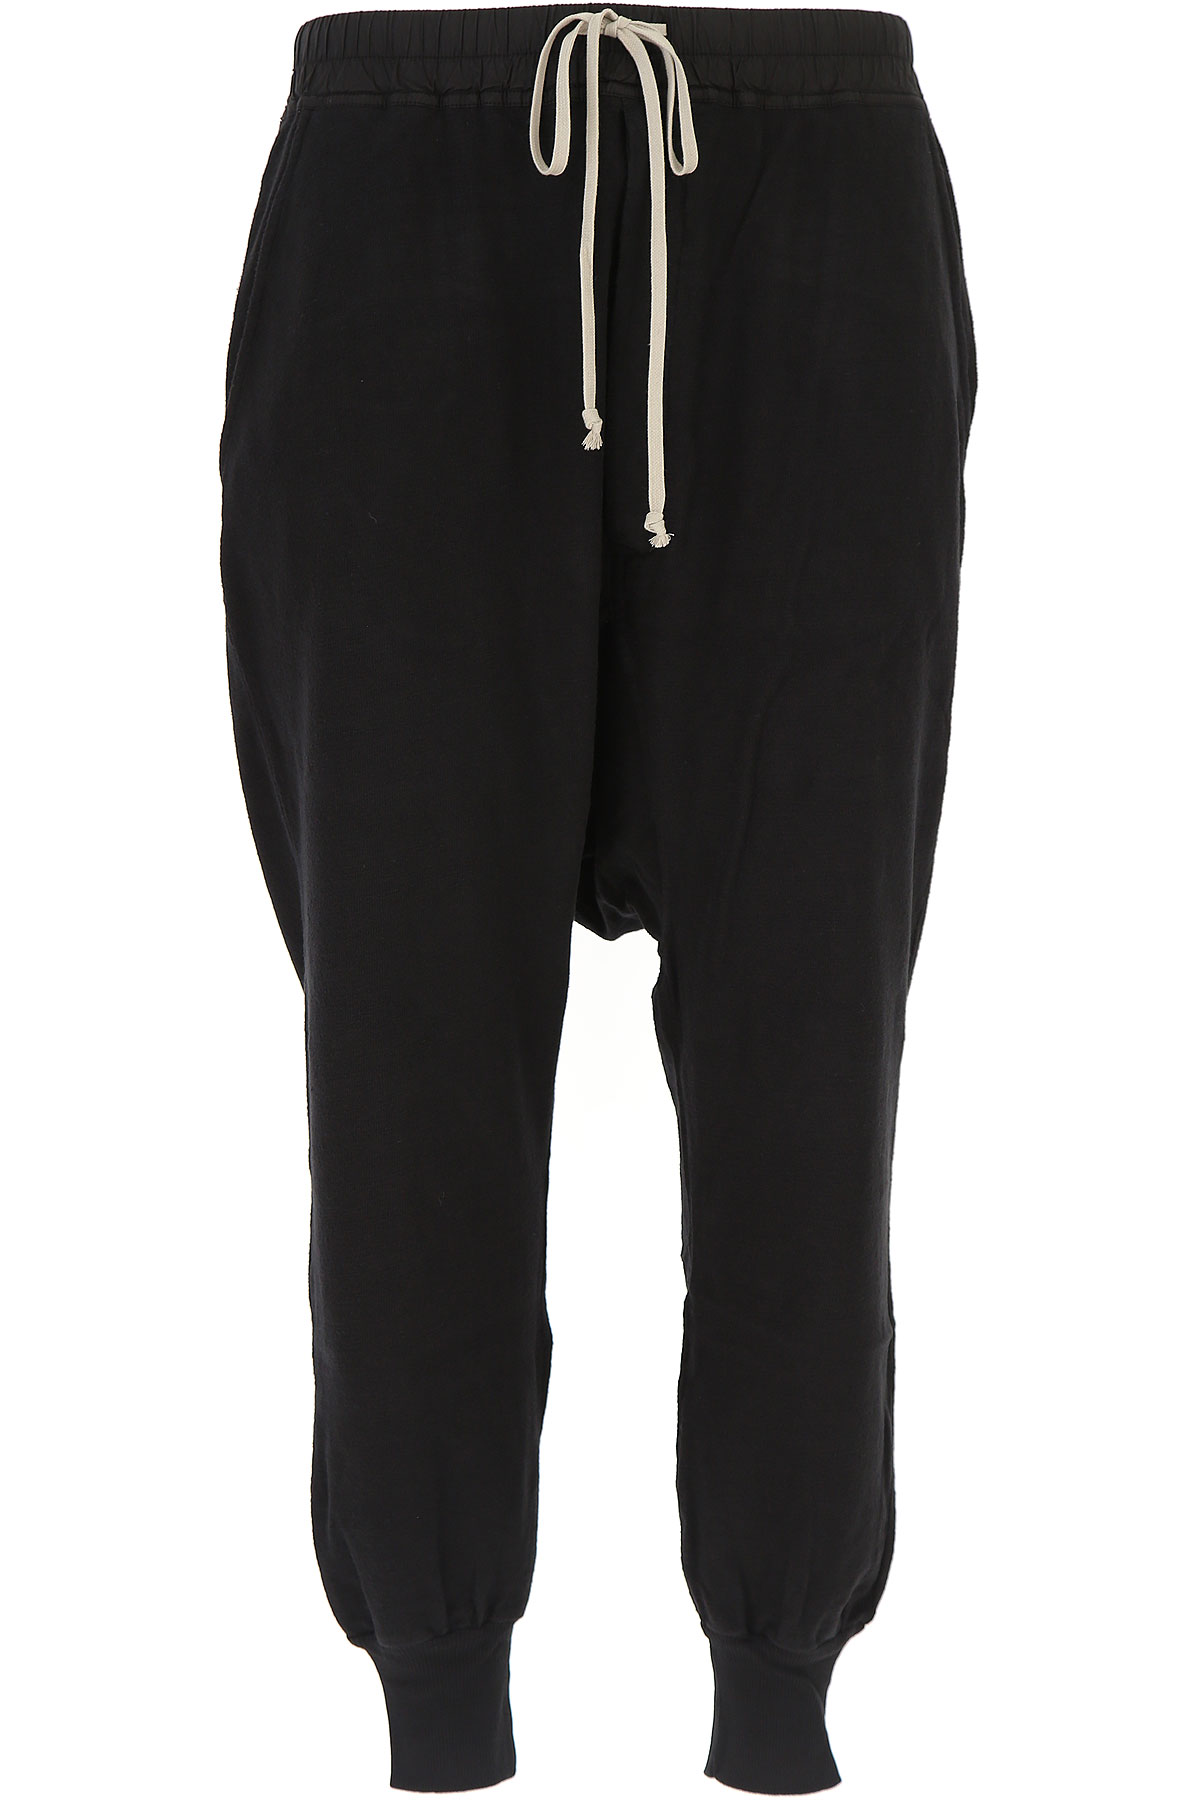 Image of Rick Owens DRKSHDW Mens Clothing, Black, Cotton, 2017, L M S XL